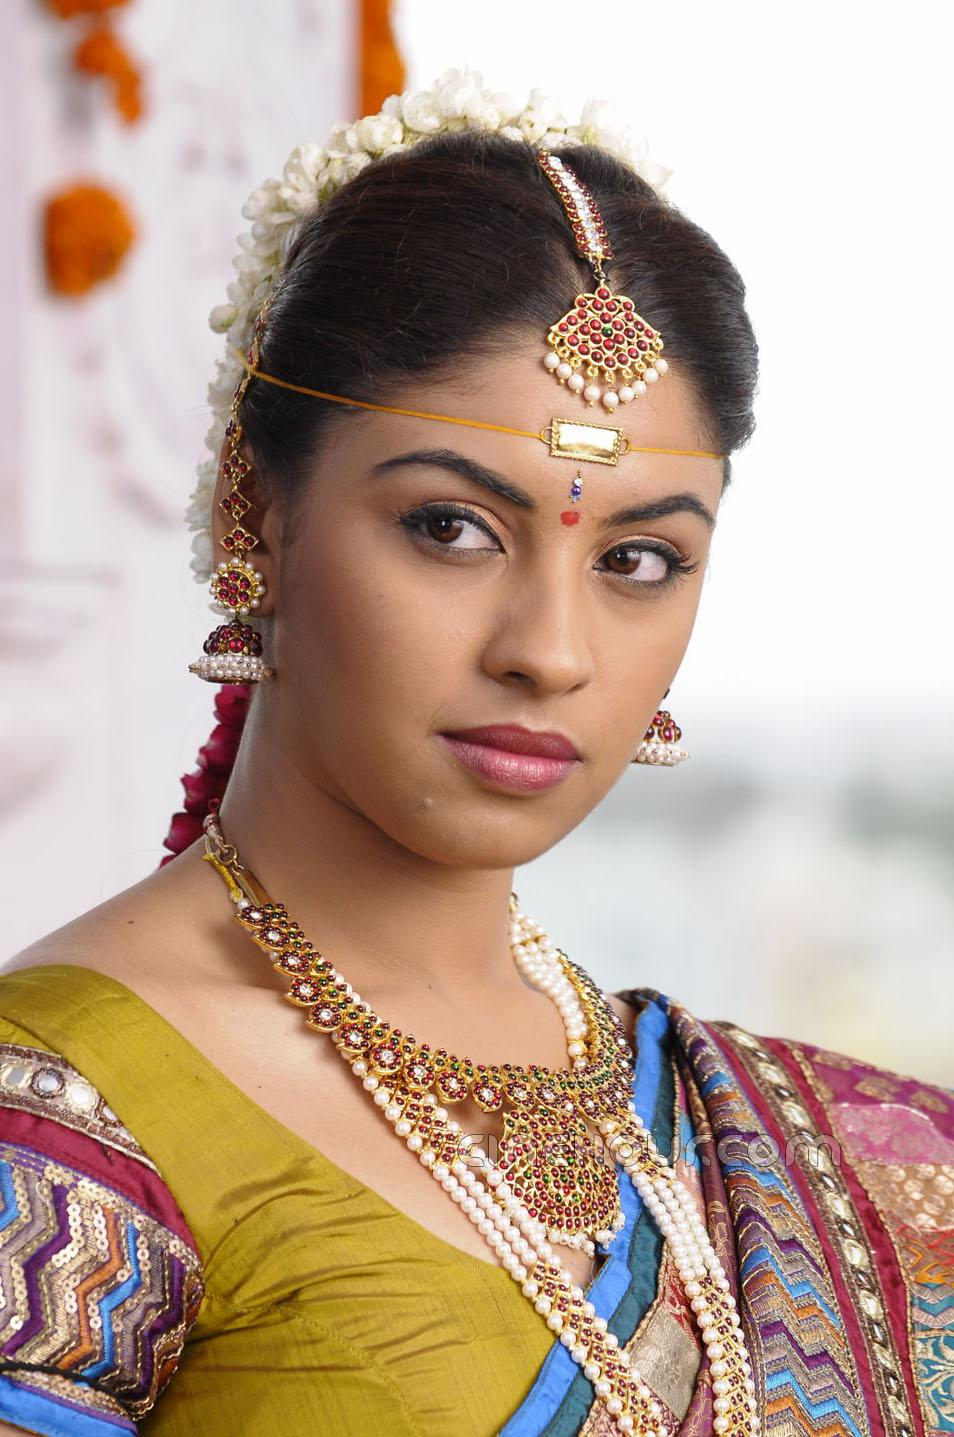 Indian Film Actress Profiles Biodata Actress Richa Gangopadhyay In Wedding Dress Gallery